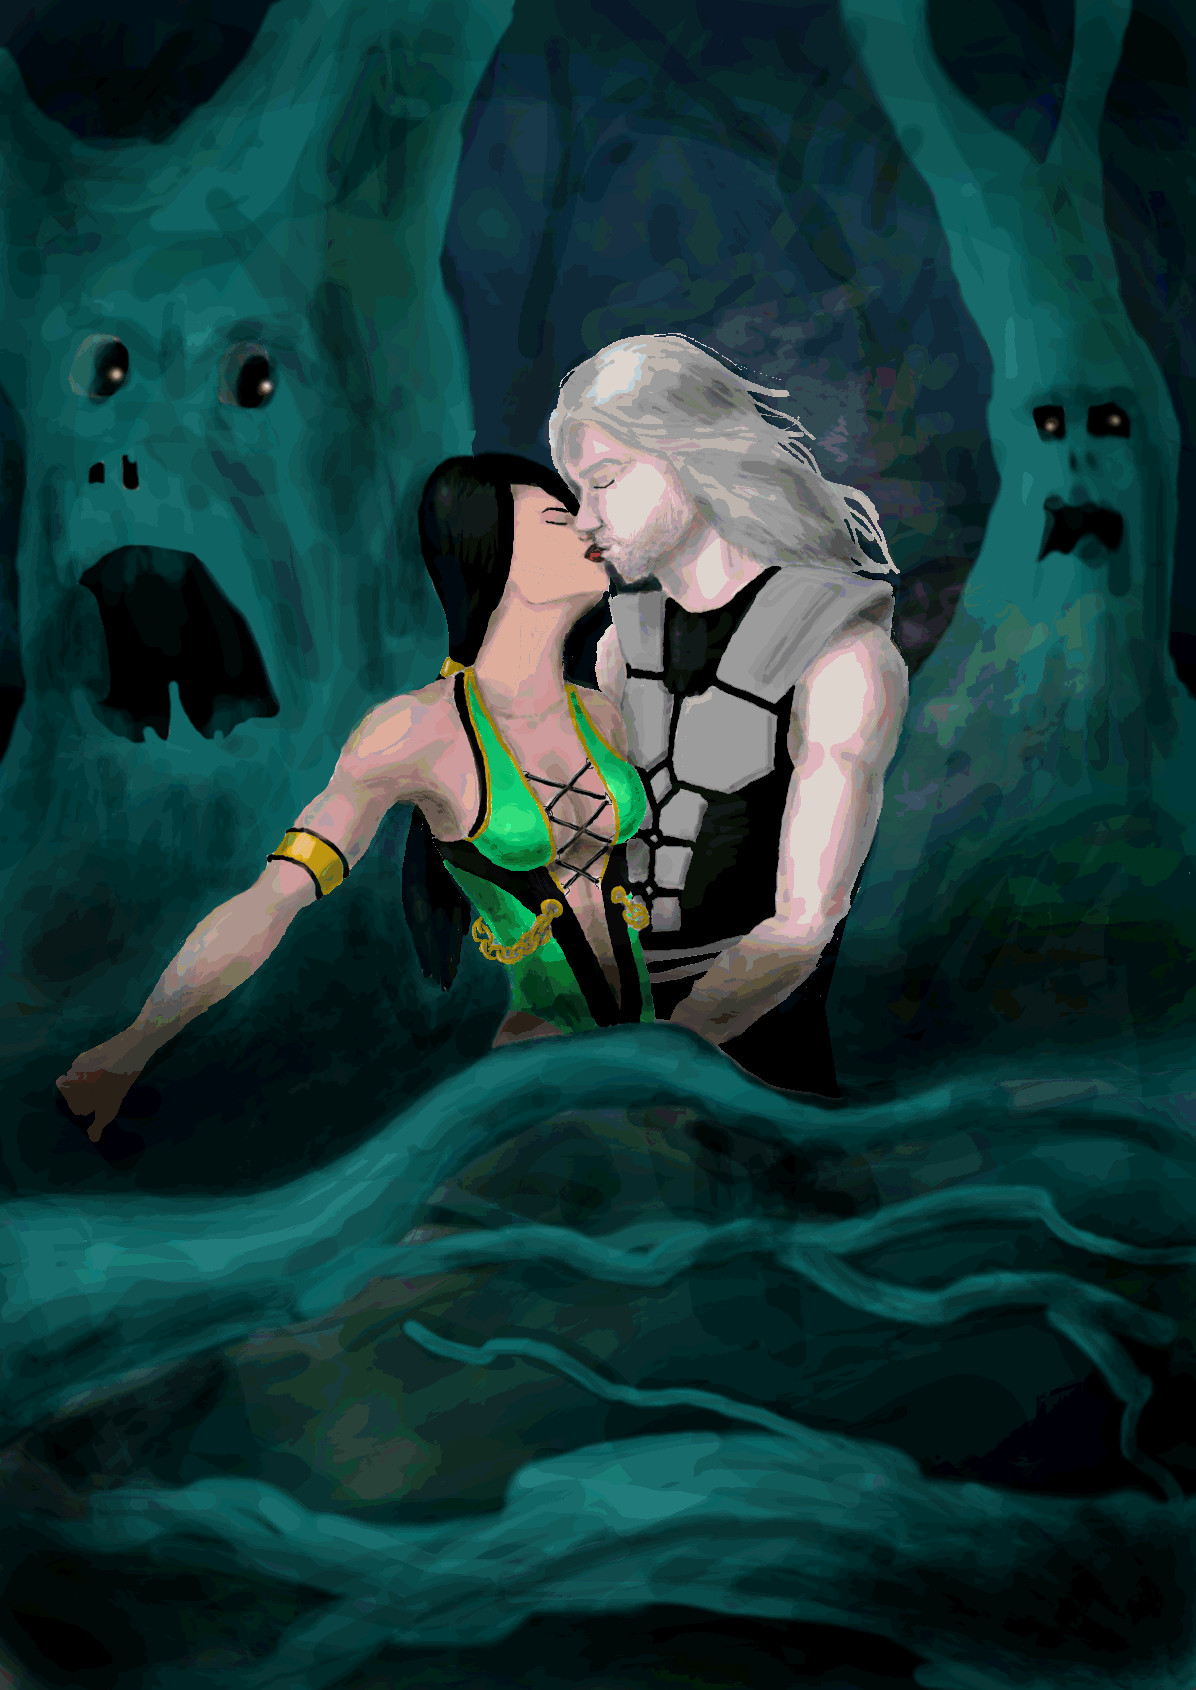 jade and smoke kiss by levonharutunyan on deviantart